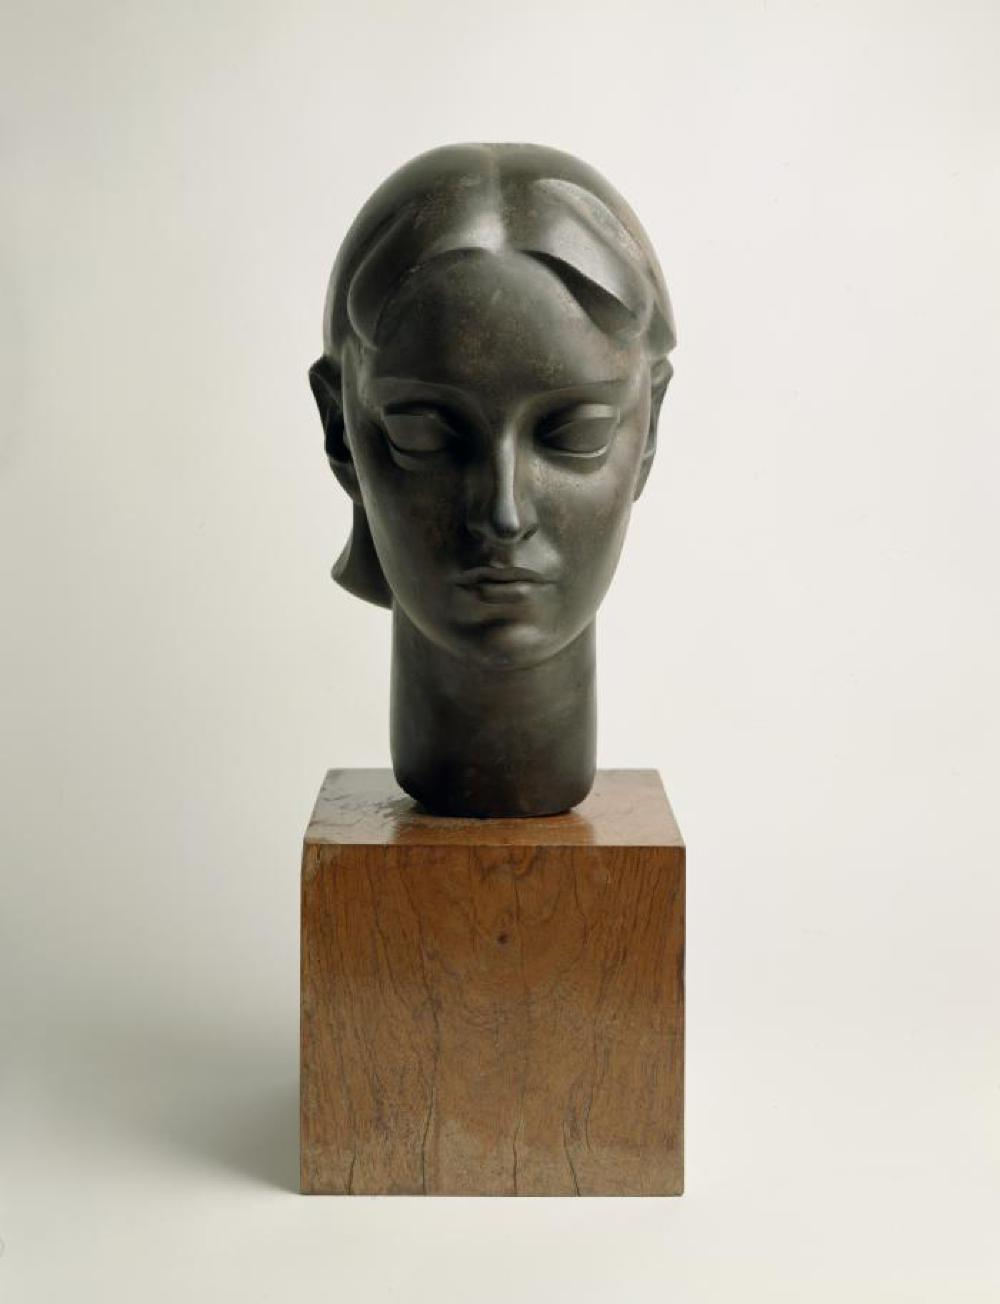 Marion Greenwood, image 1